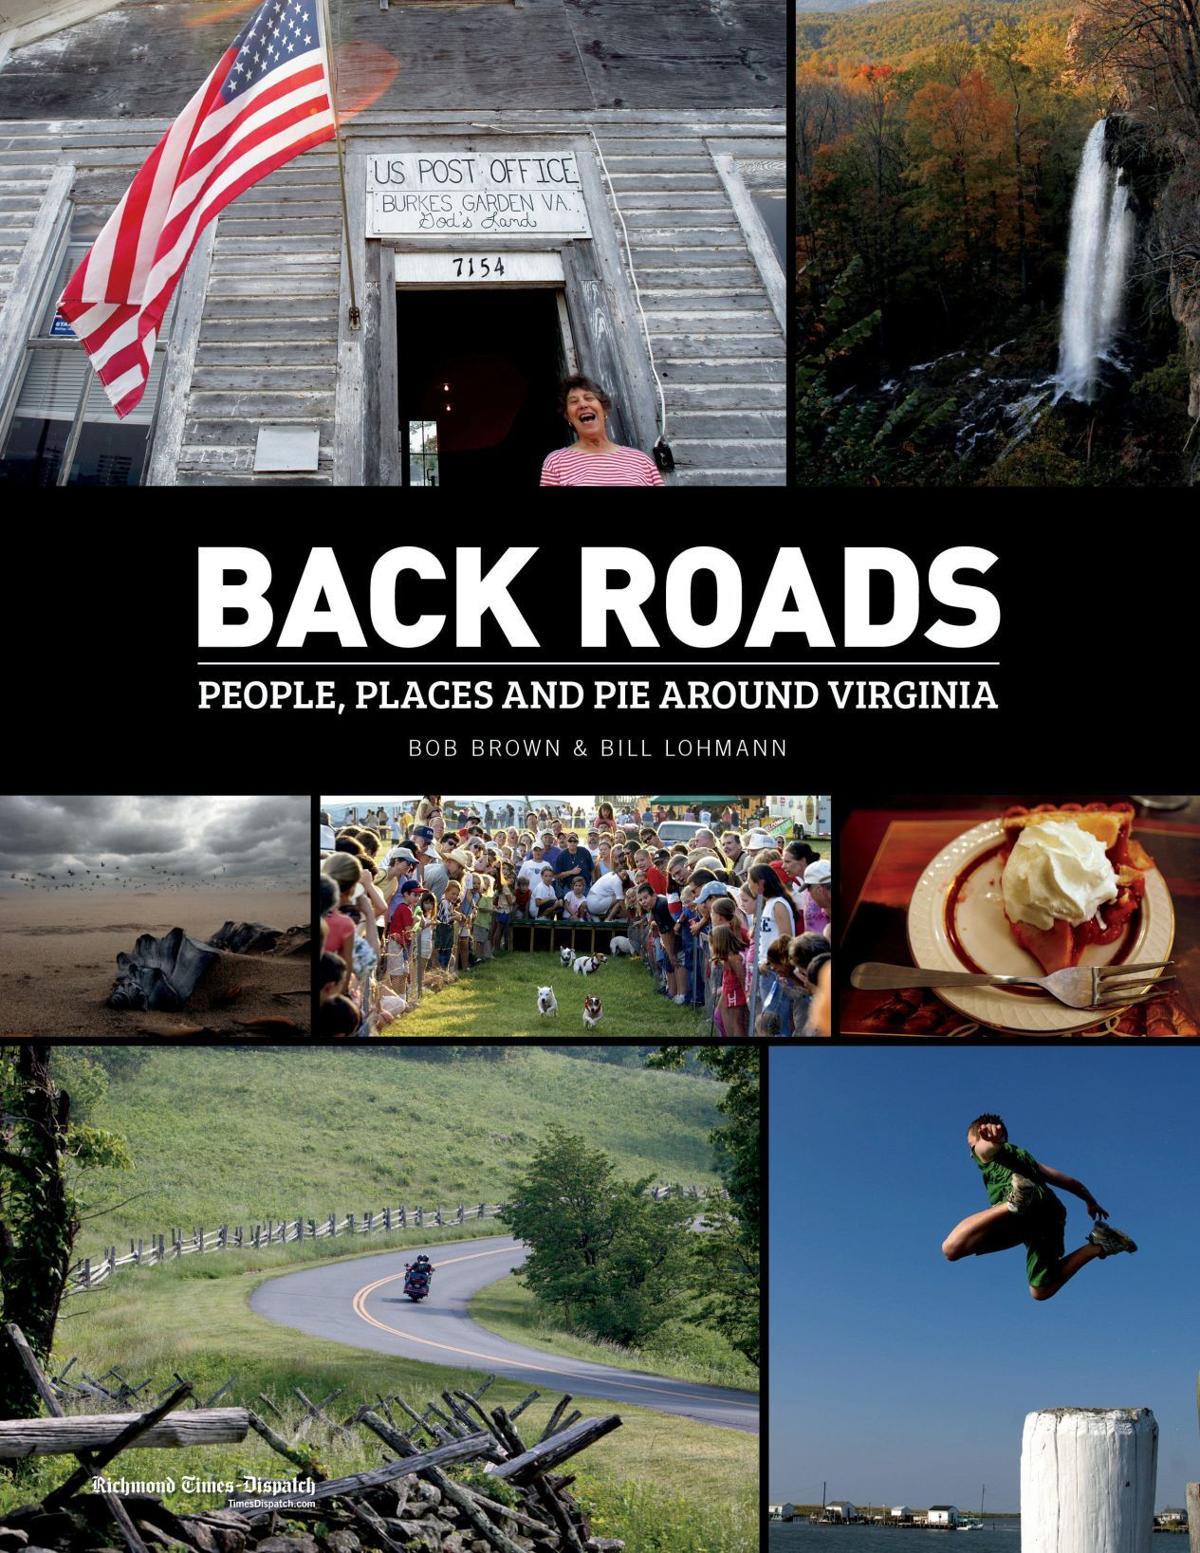 VA_Back_Roads-Front_Cover.jpg_5D16FUMS_05292014